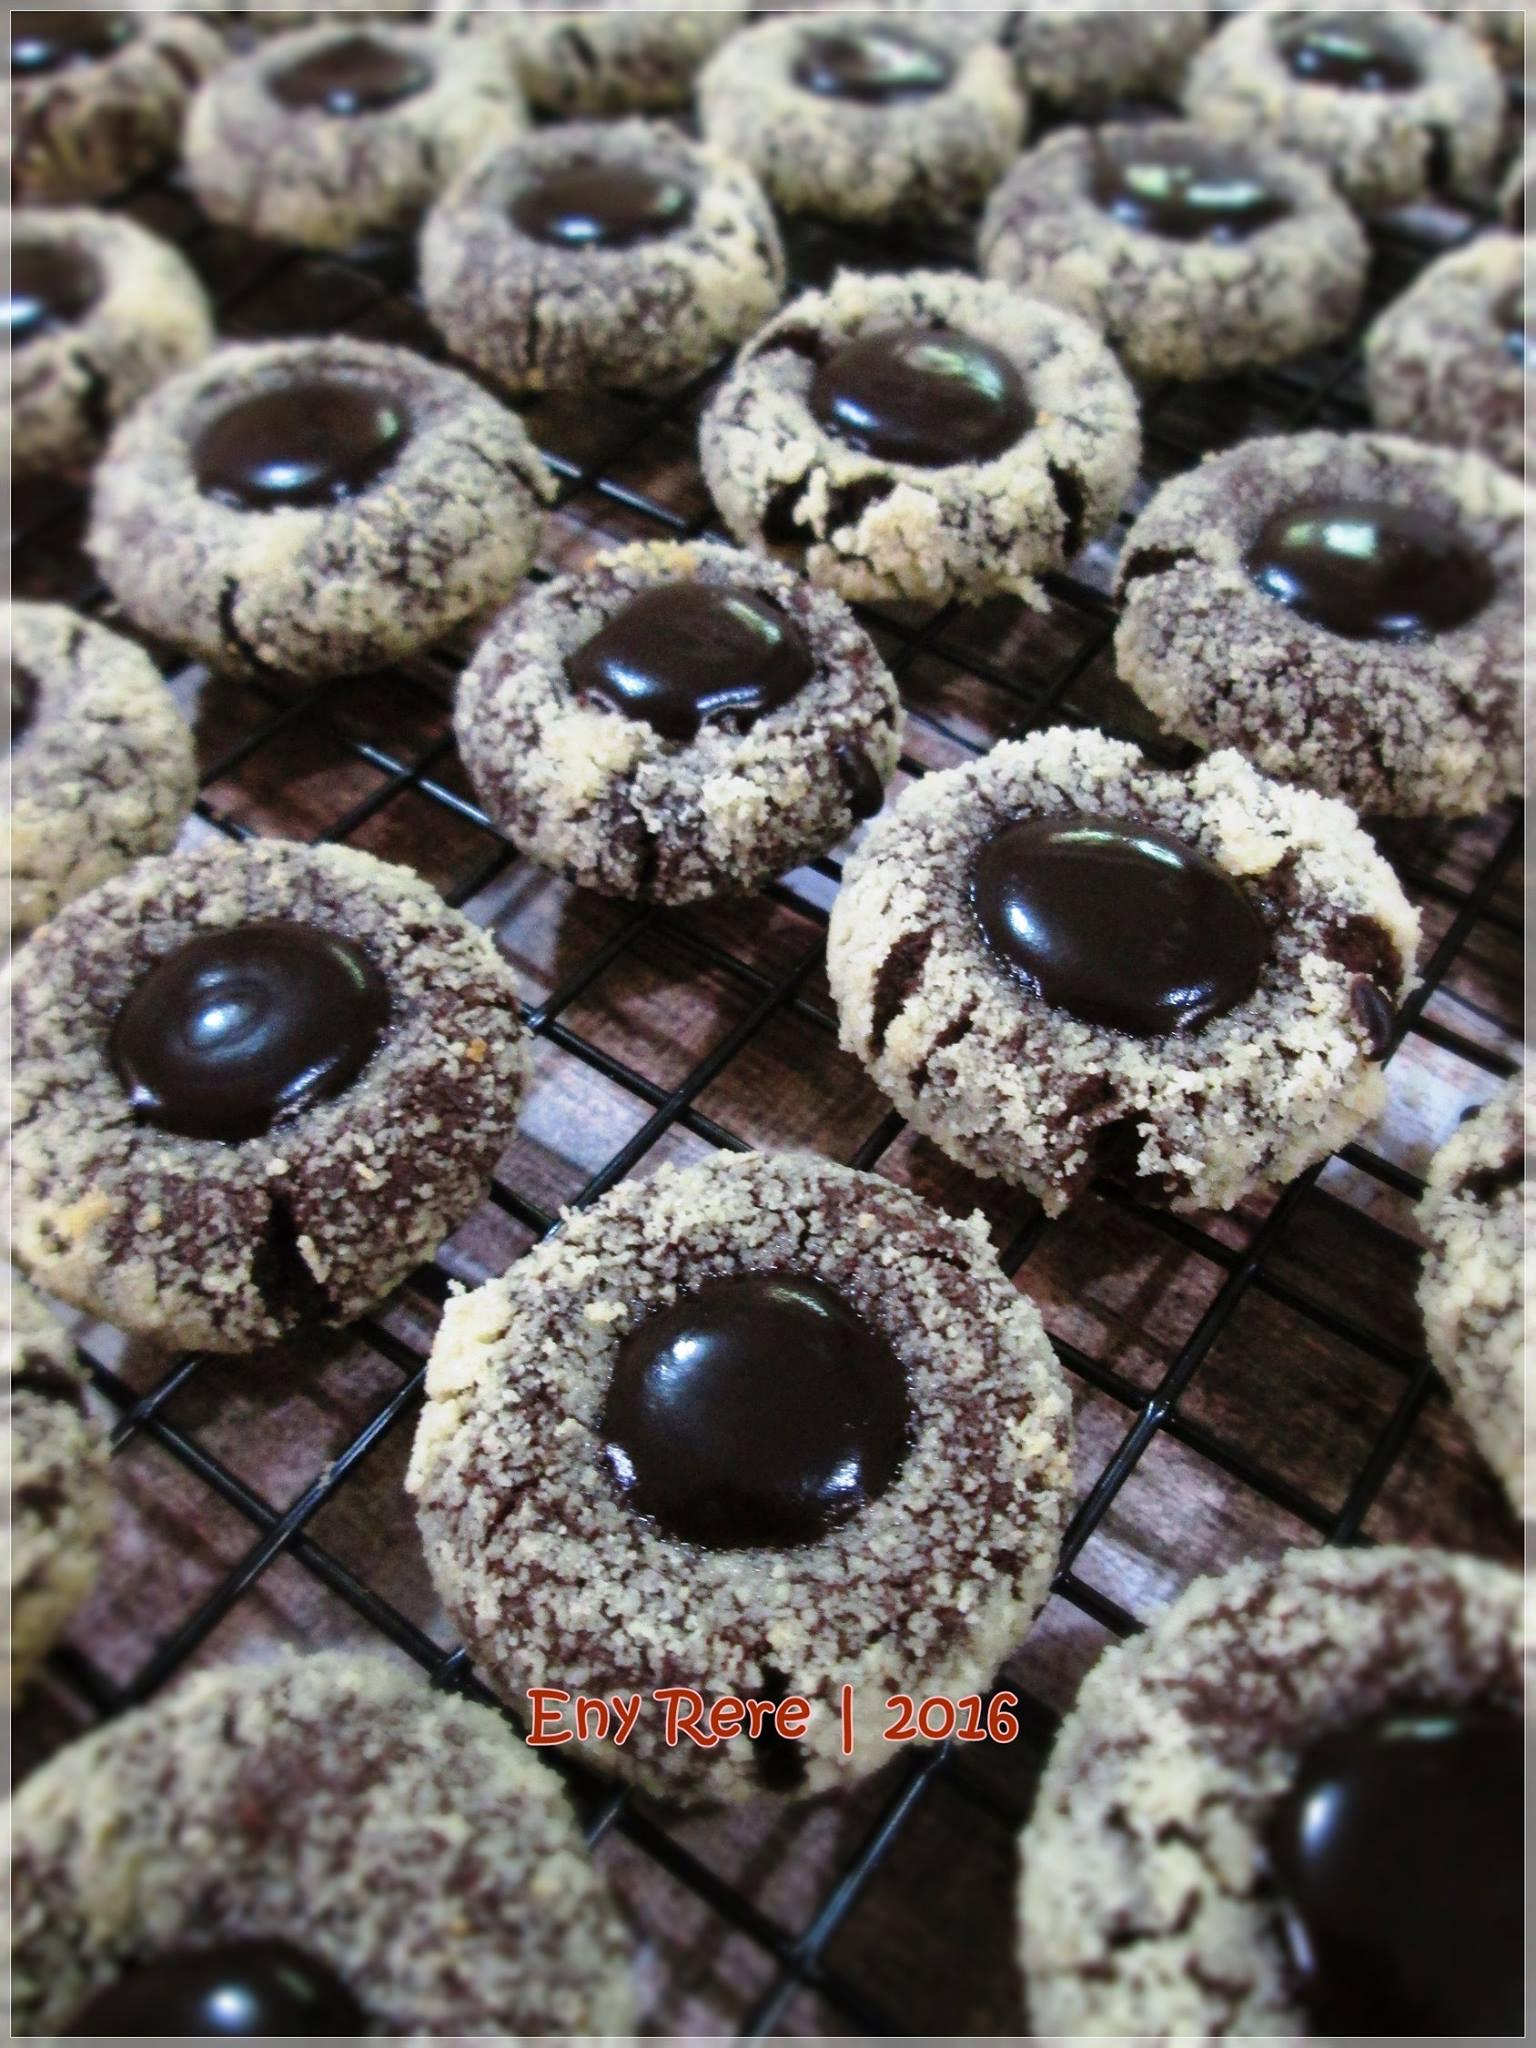 Thumbprint Cokelat Almond by Eny Rere